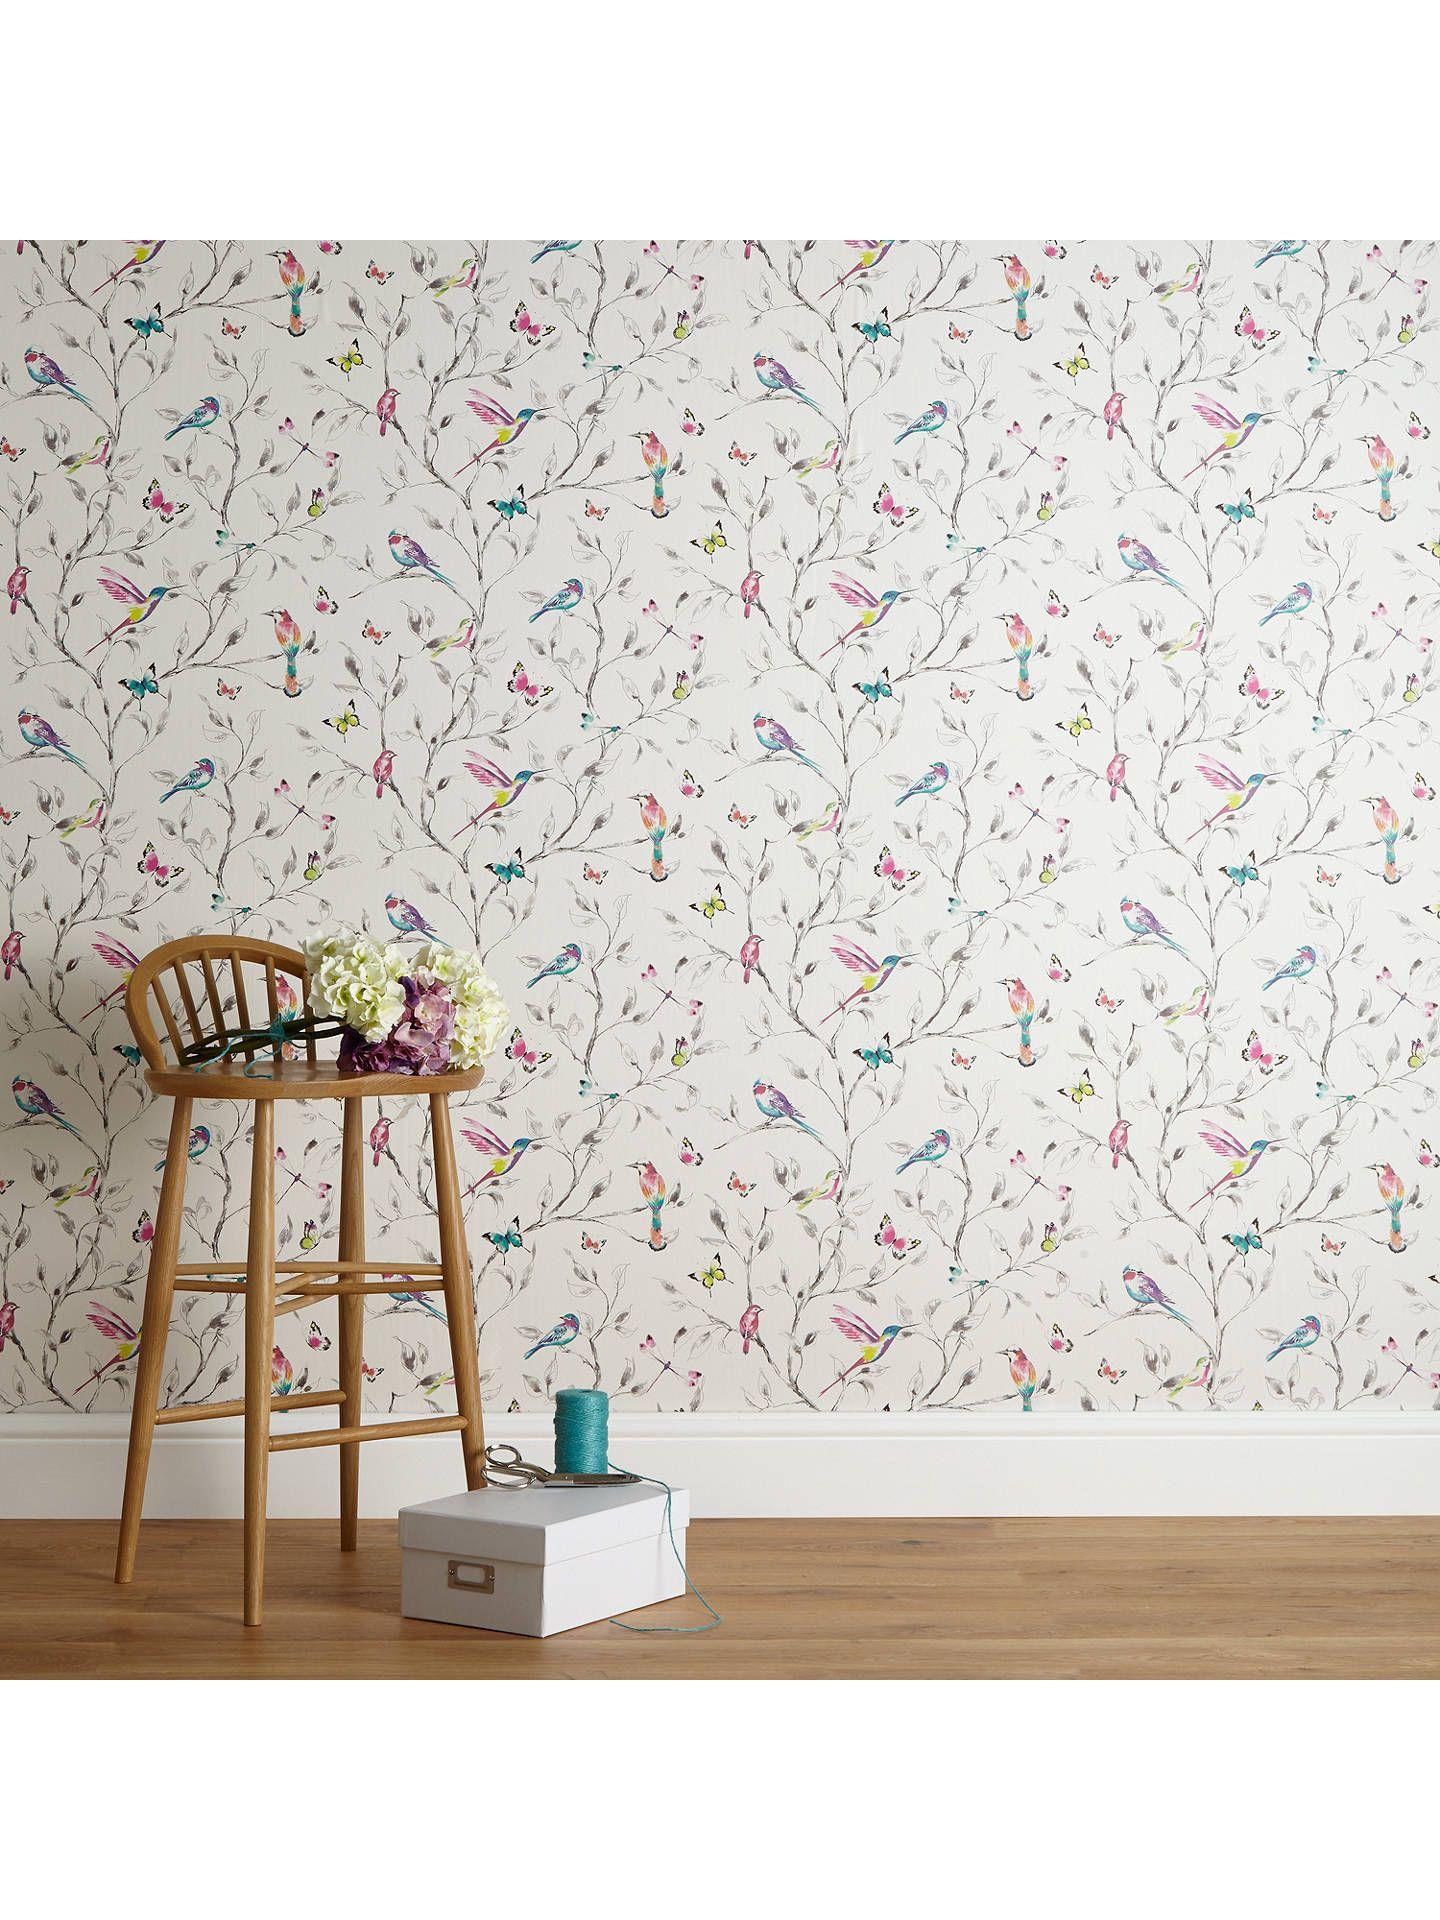 38++ Bedroom wallpaper ideas john lewis ppdb 2021